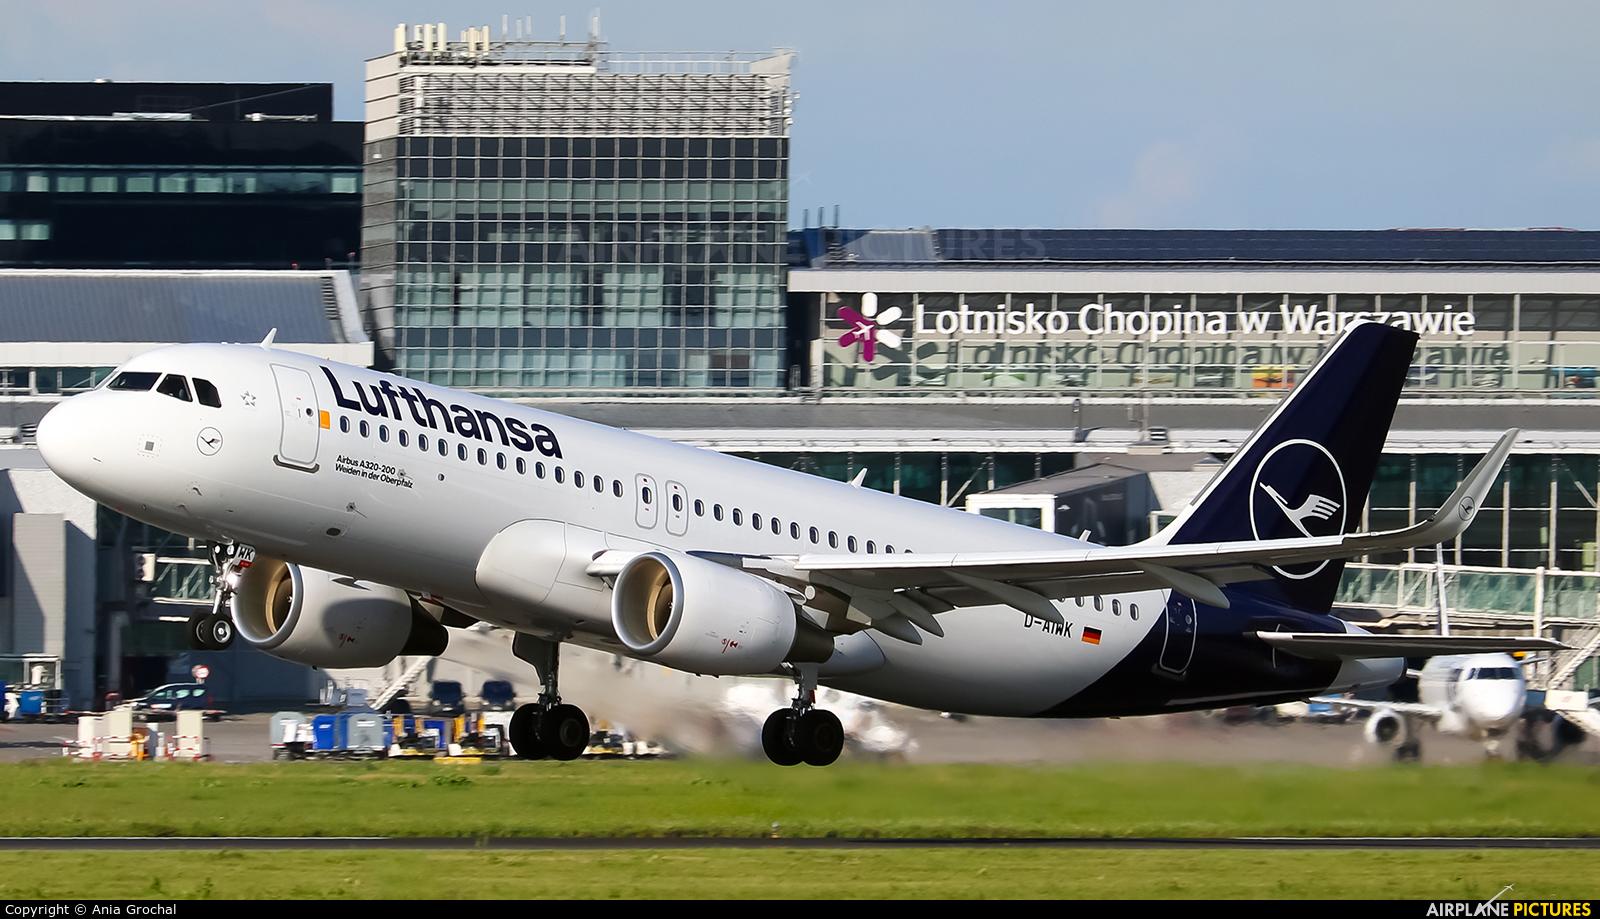 Lufthansa D-AIWK aircraft at Warsaw - Frederic Chopin